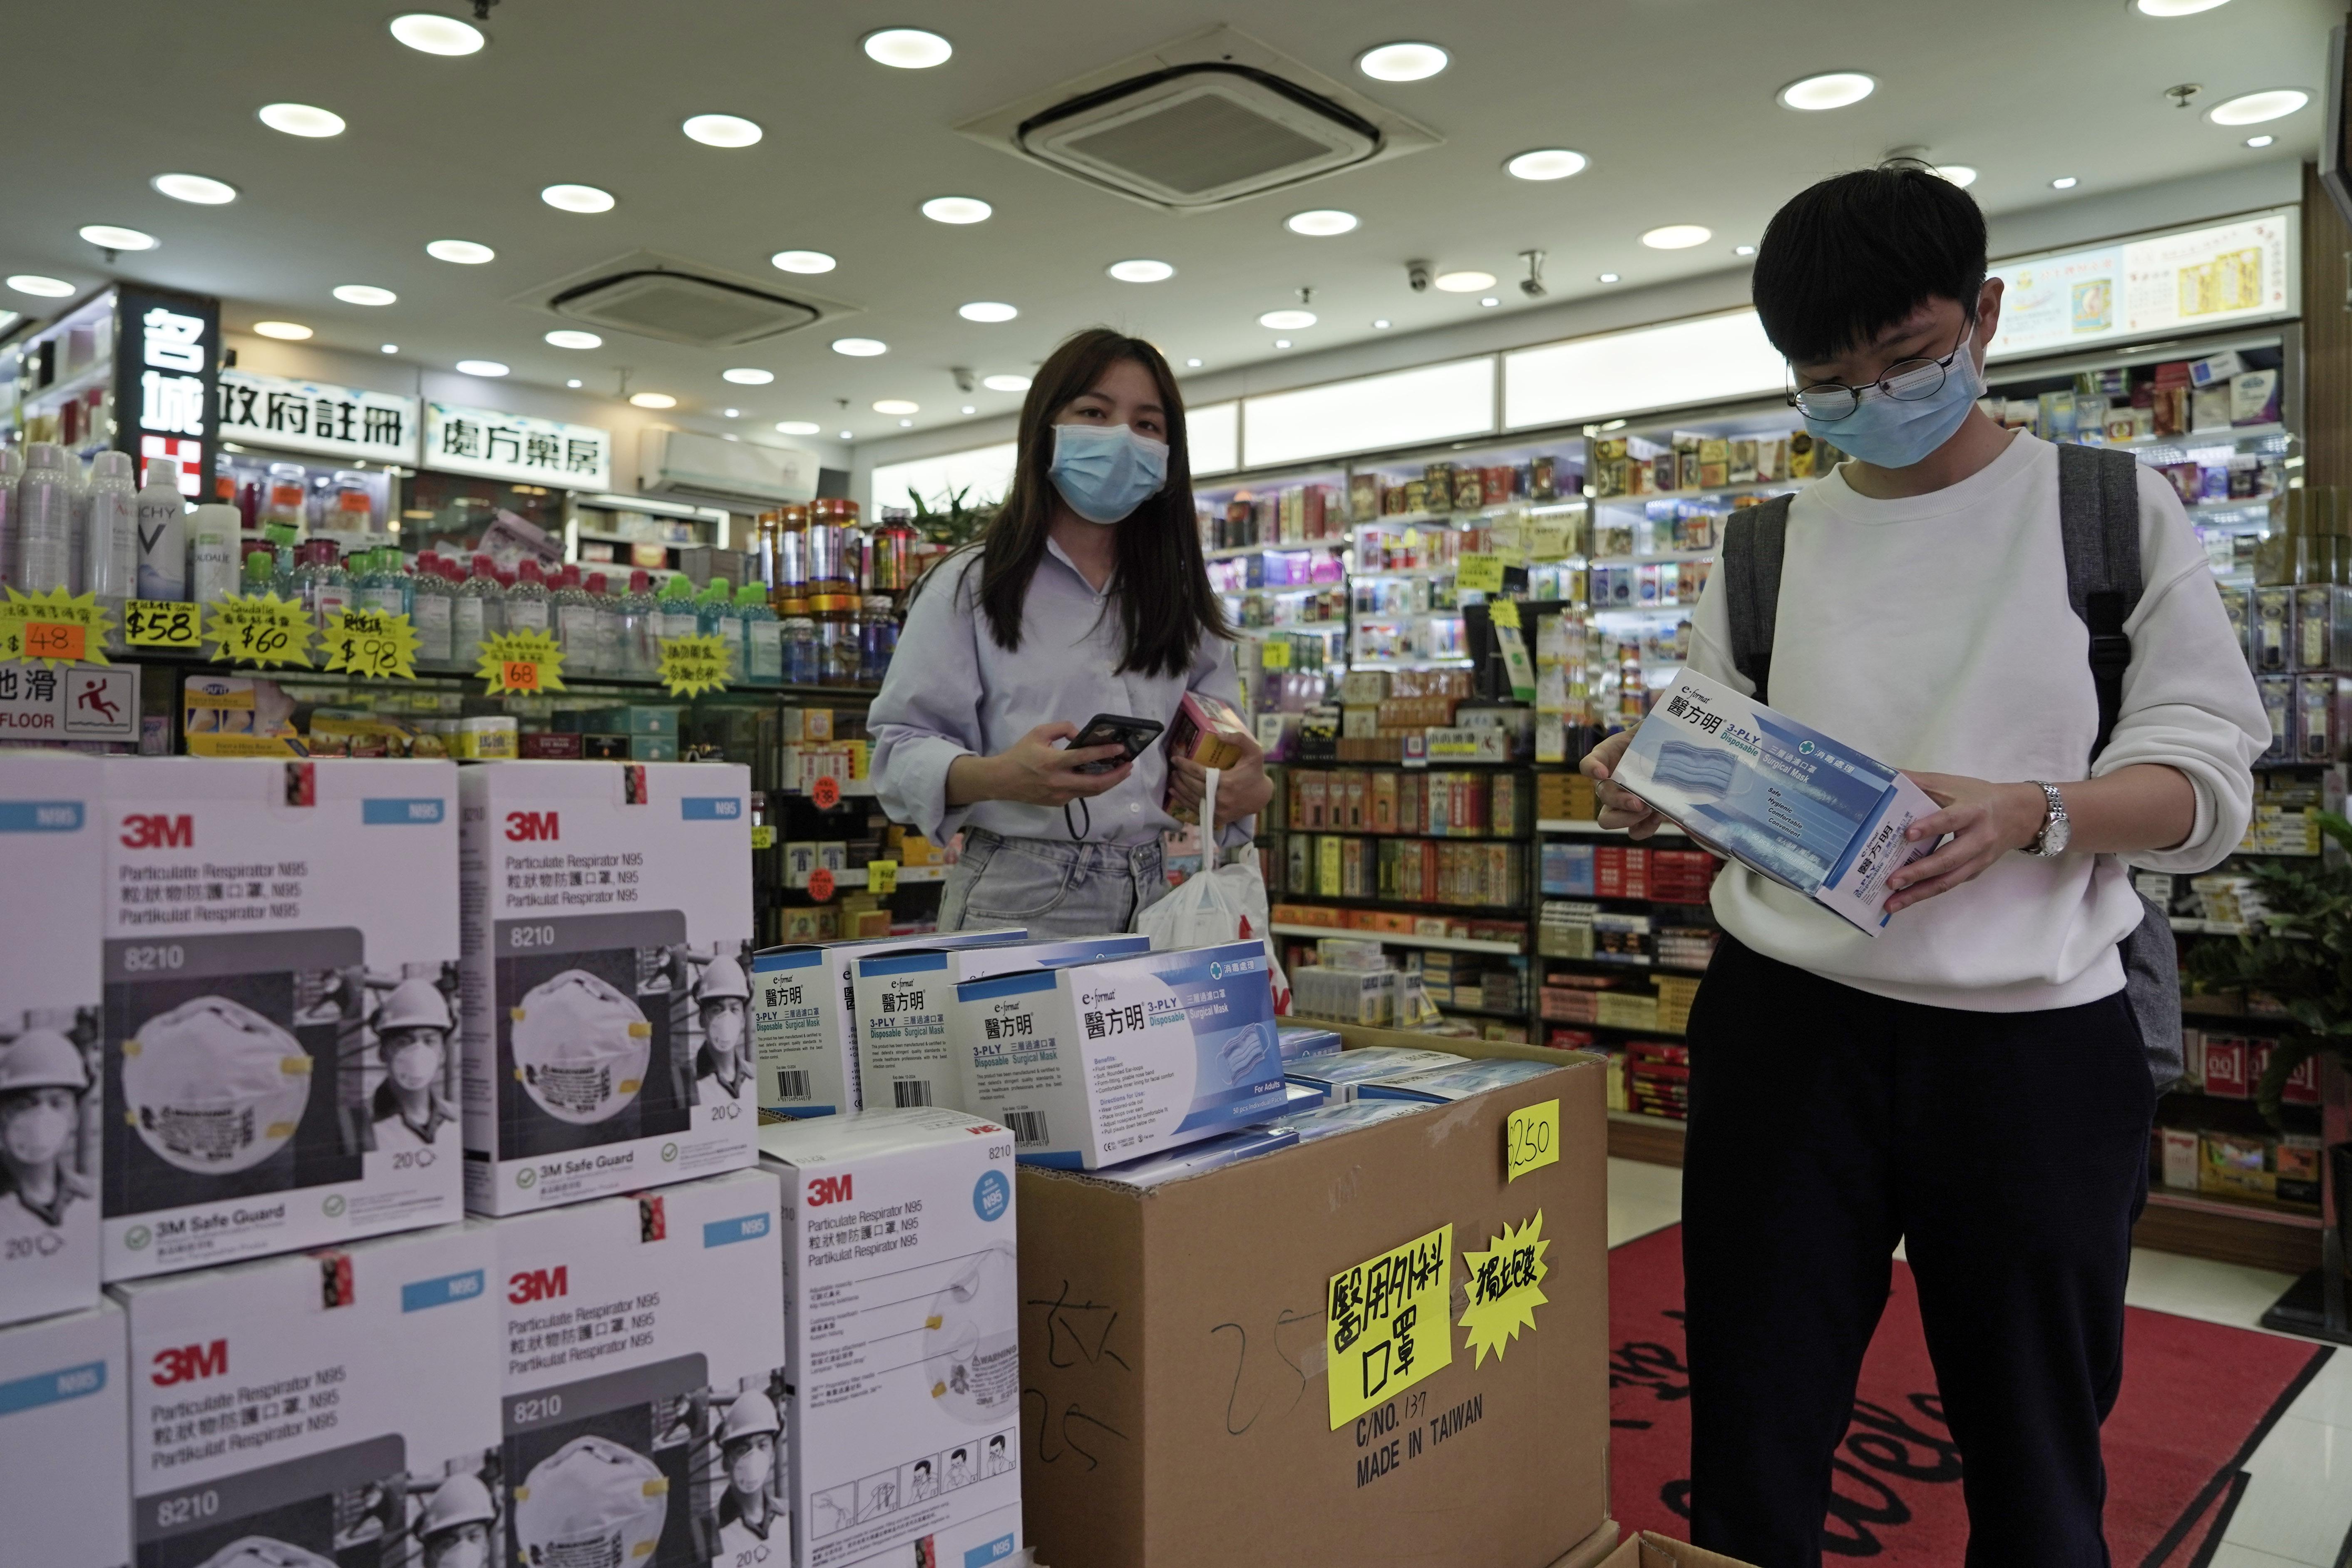 Hong Kong face mask Coronavirus